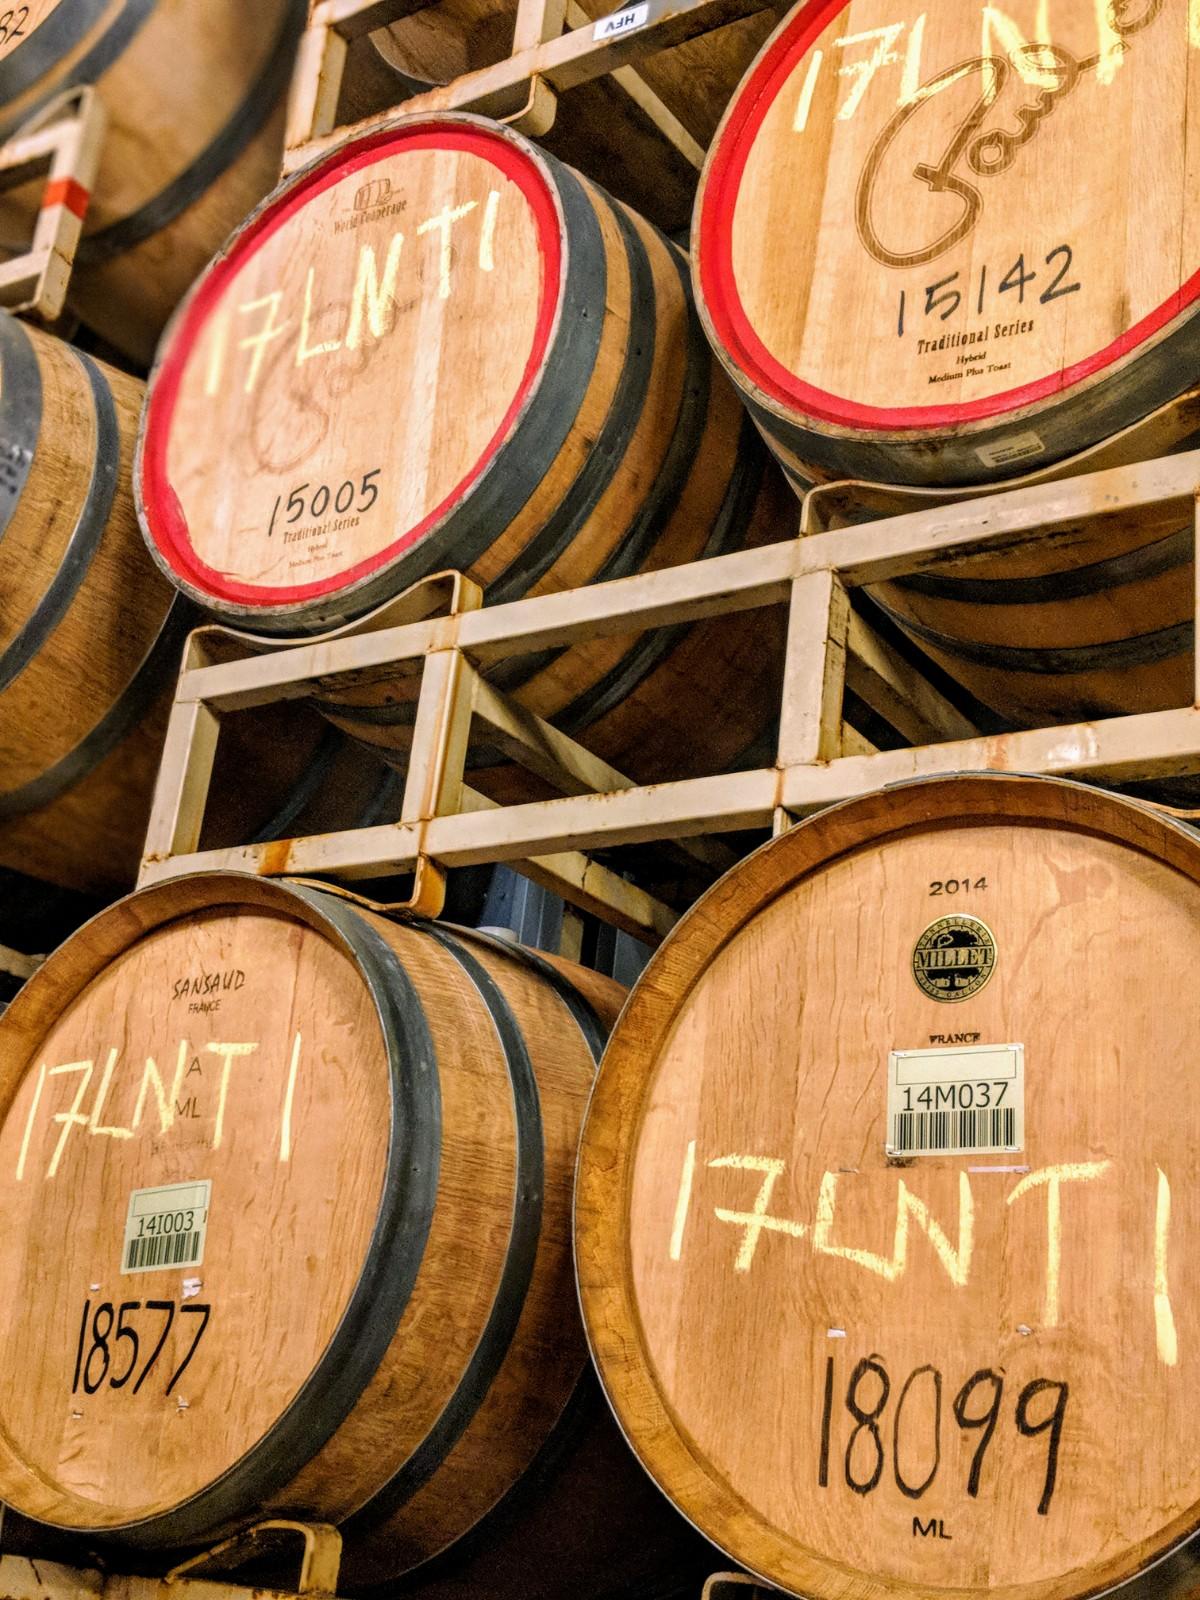 Wine barrels at Messina Hof Winery